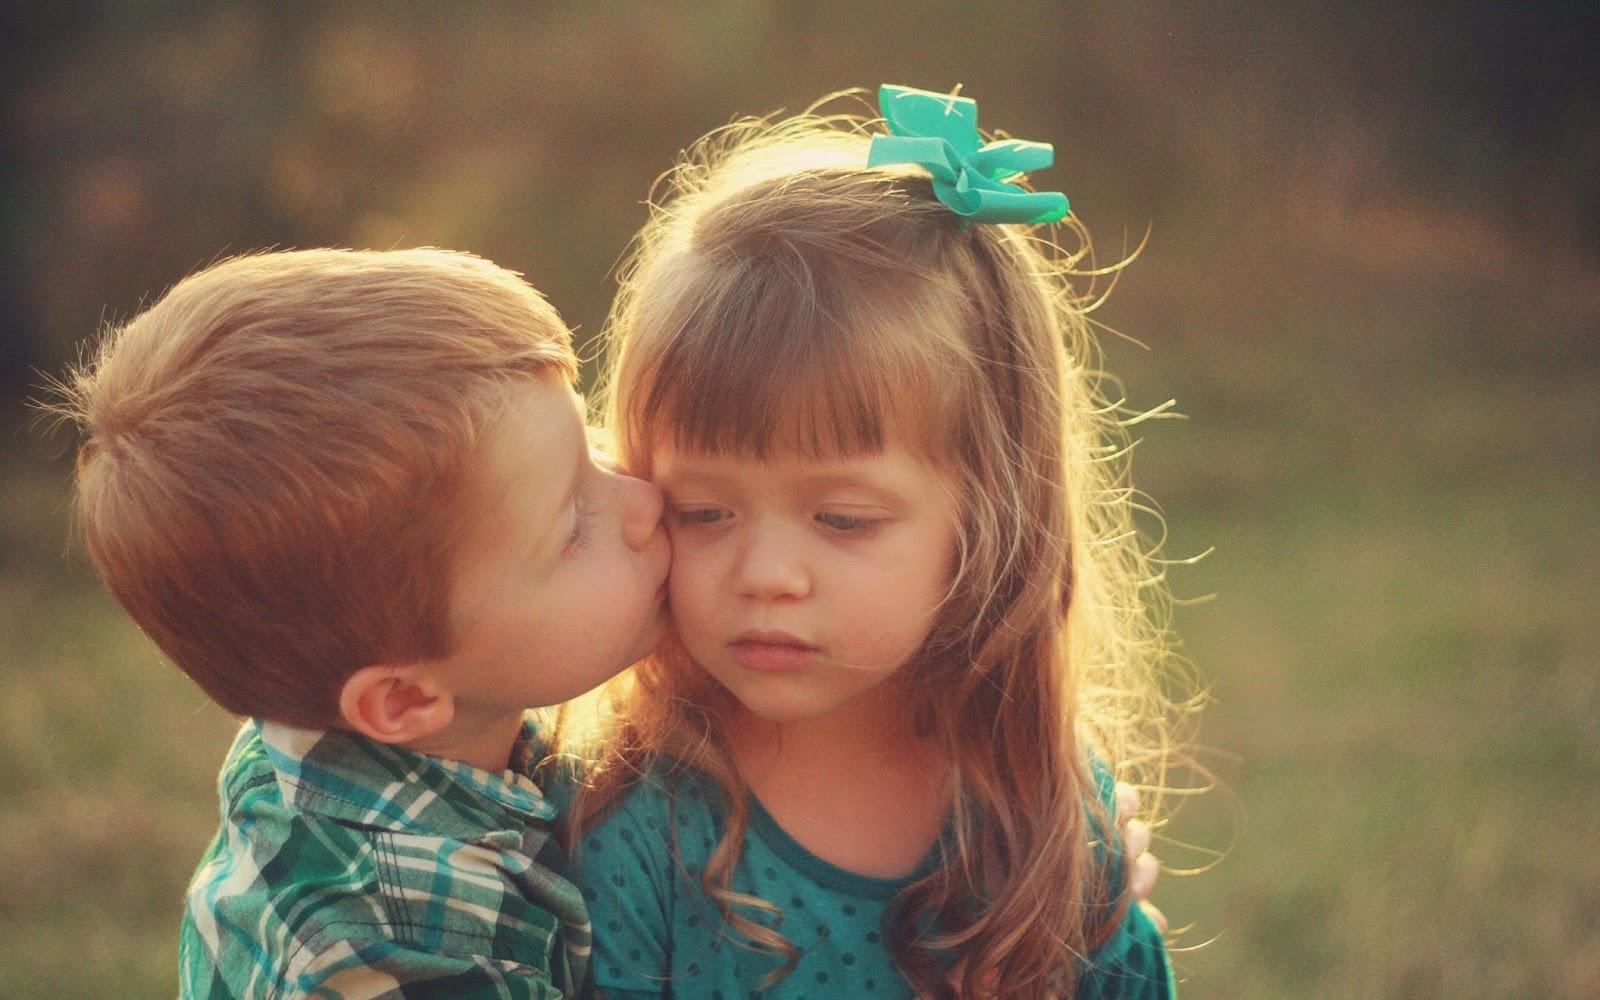 Gambar lucu bayi laki-laki mencium bayi perempuan gratis